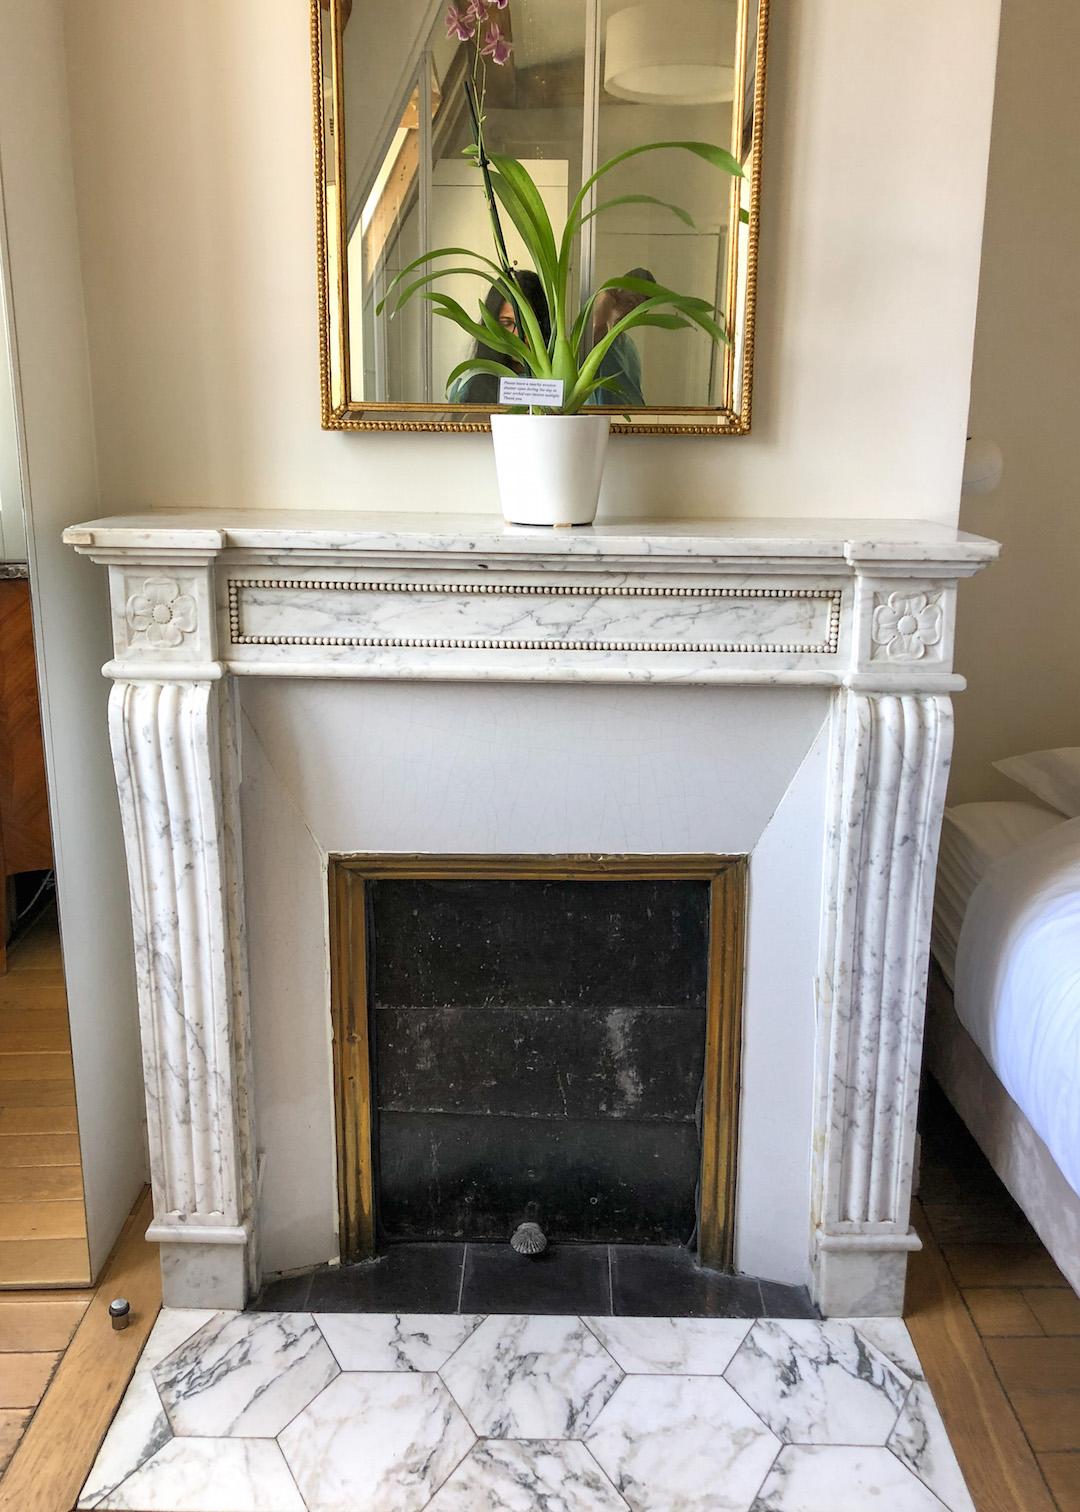 Original Fireplace at Airbnb in Paris